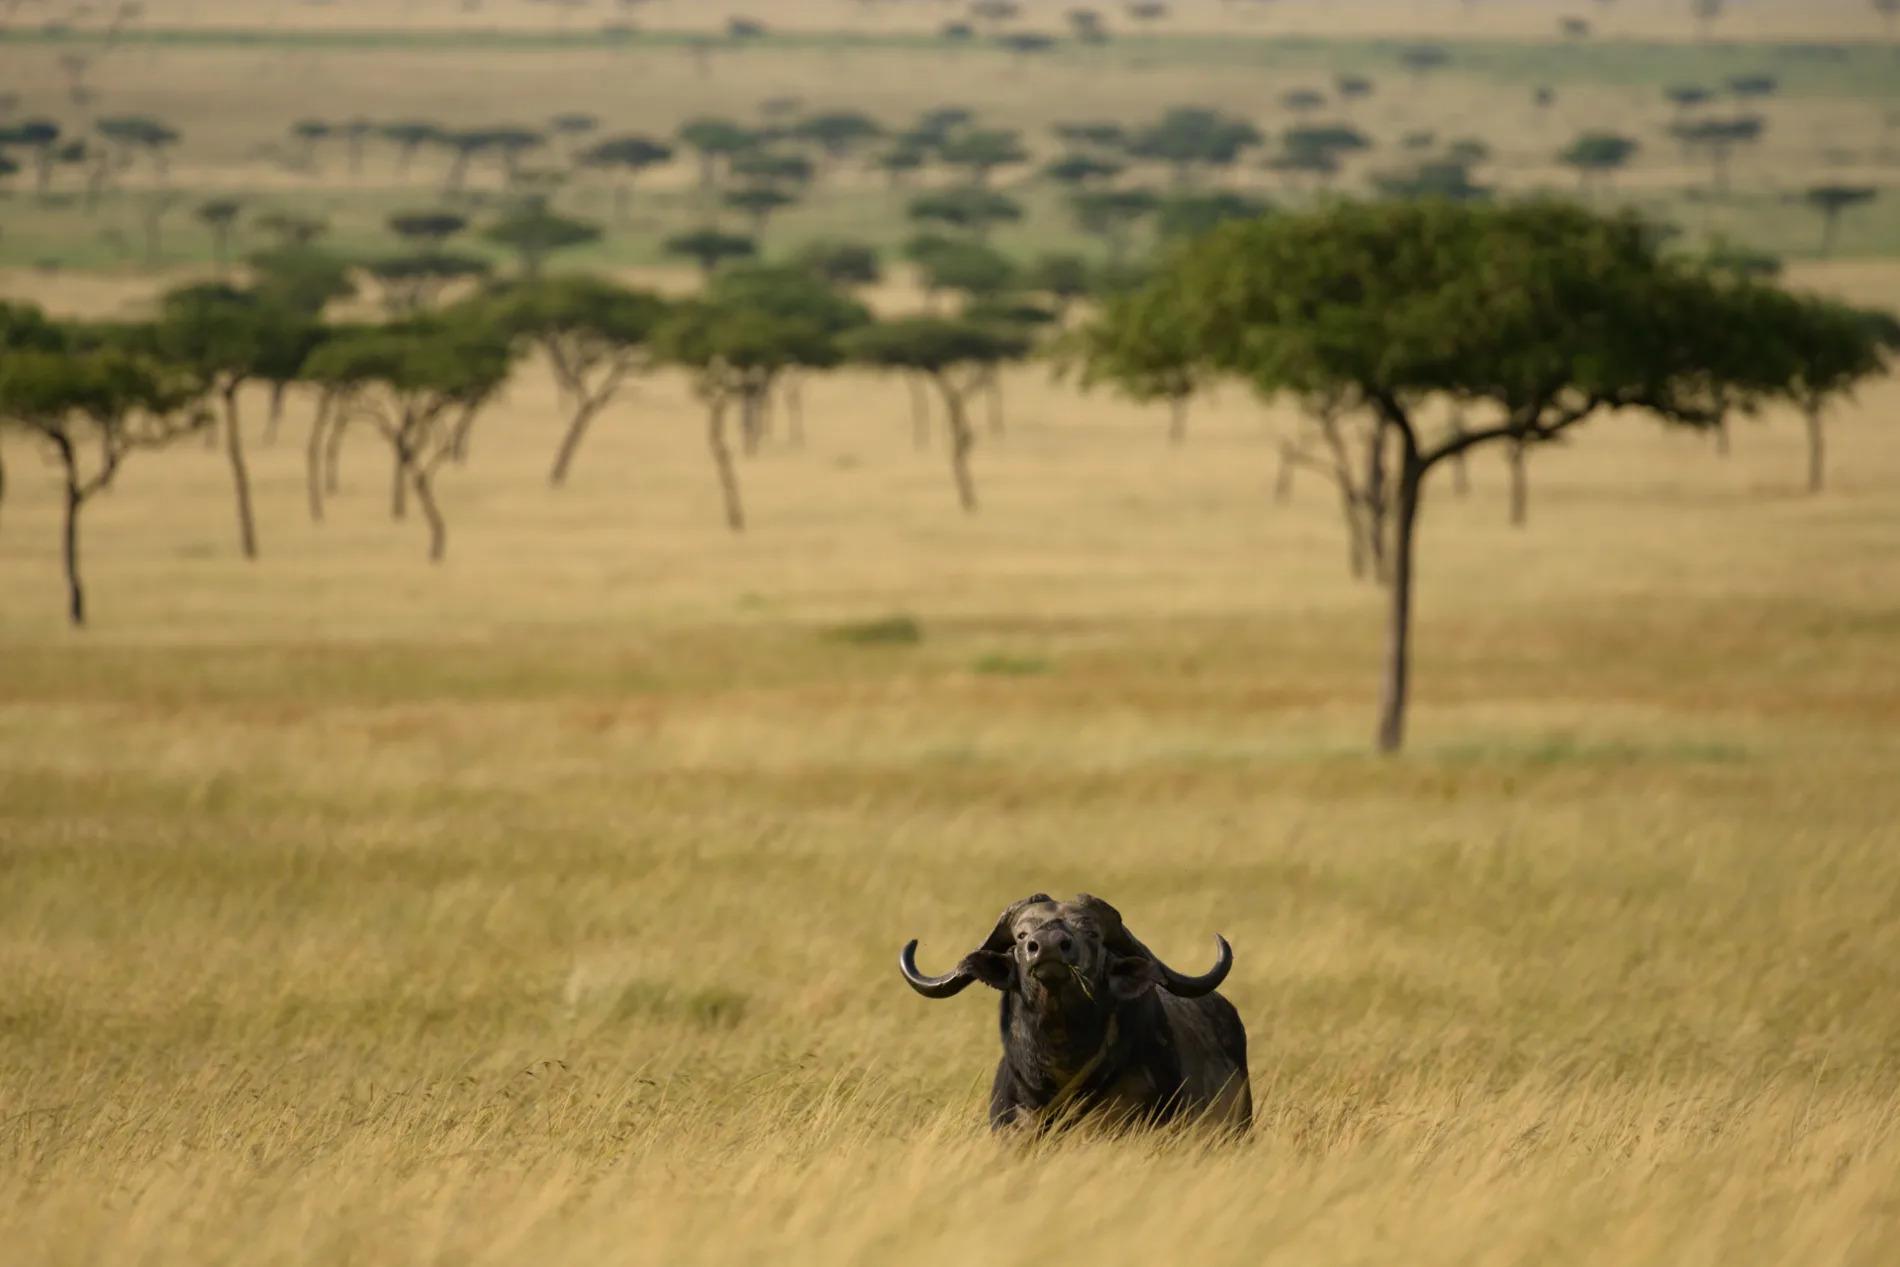 Buffalo in distance